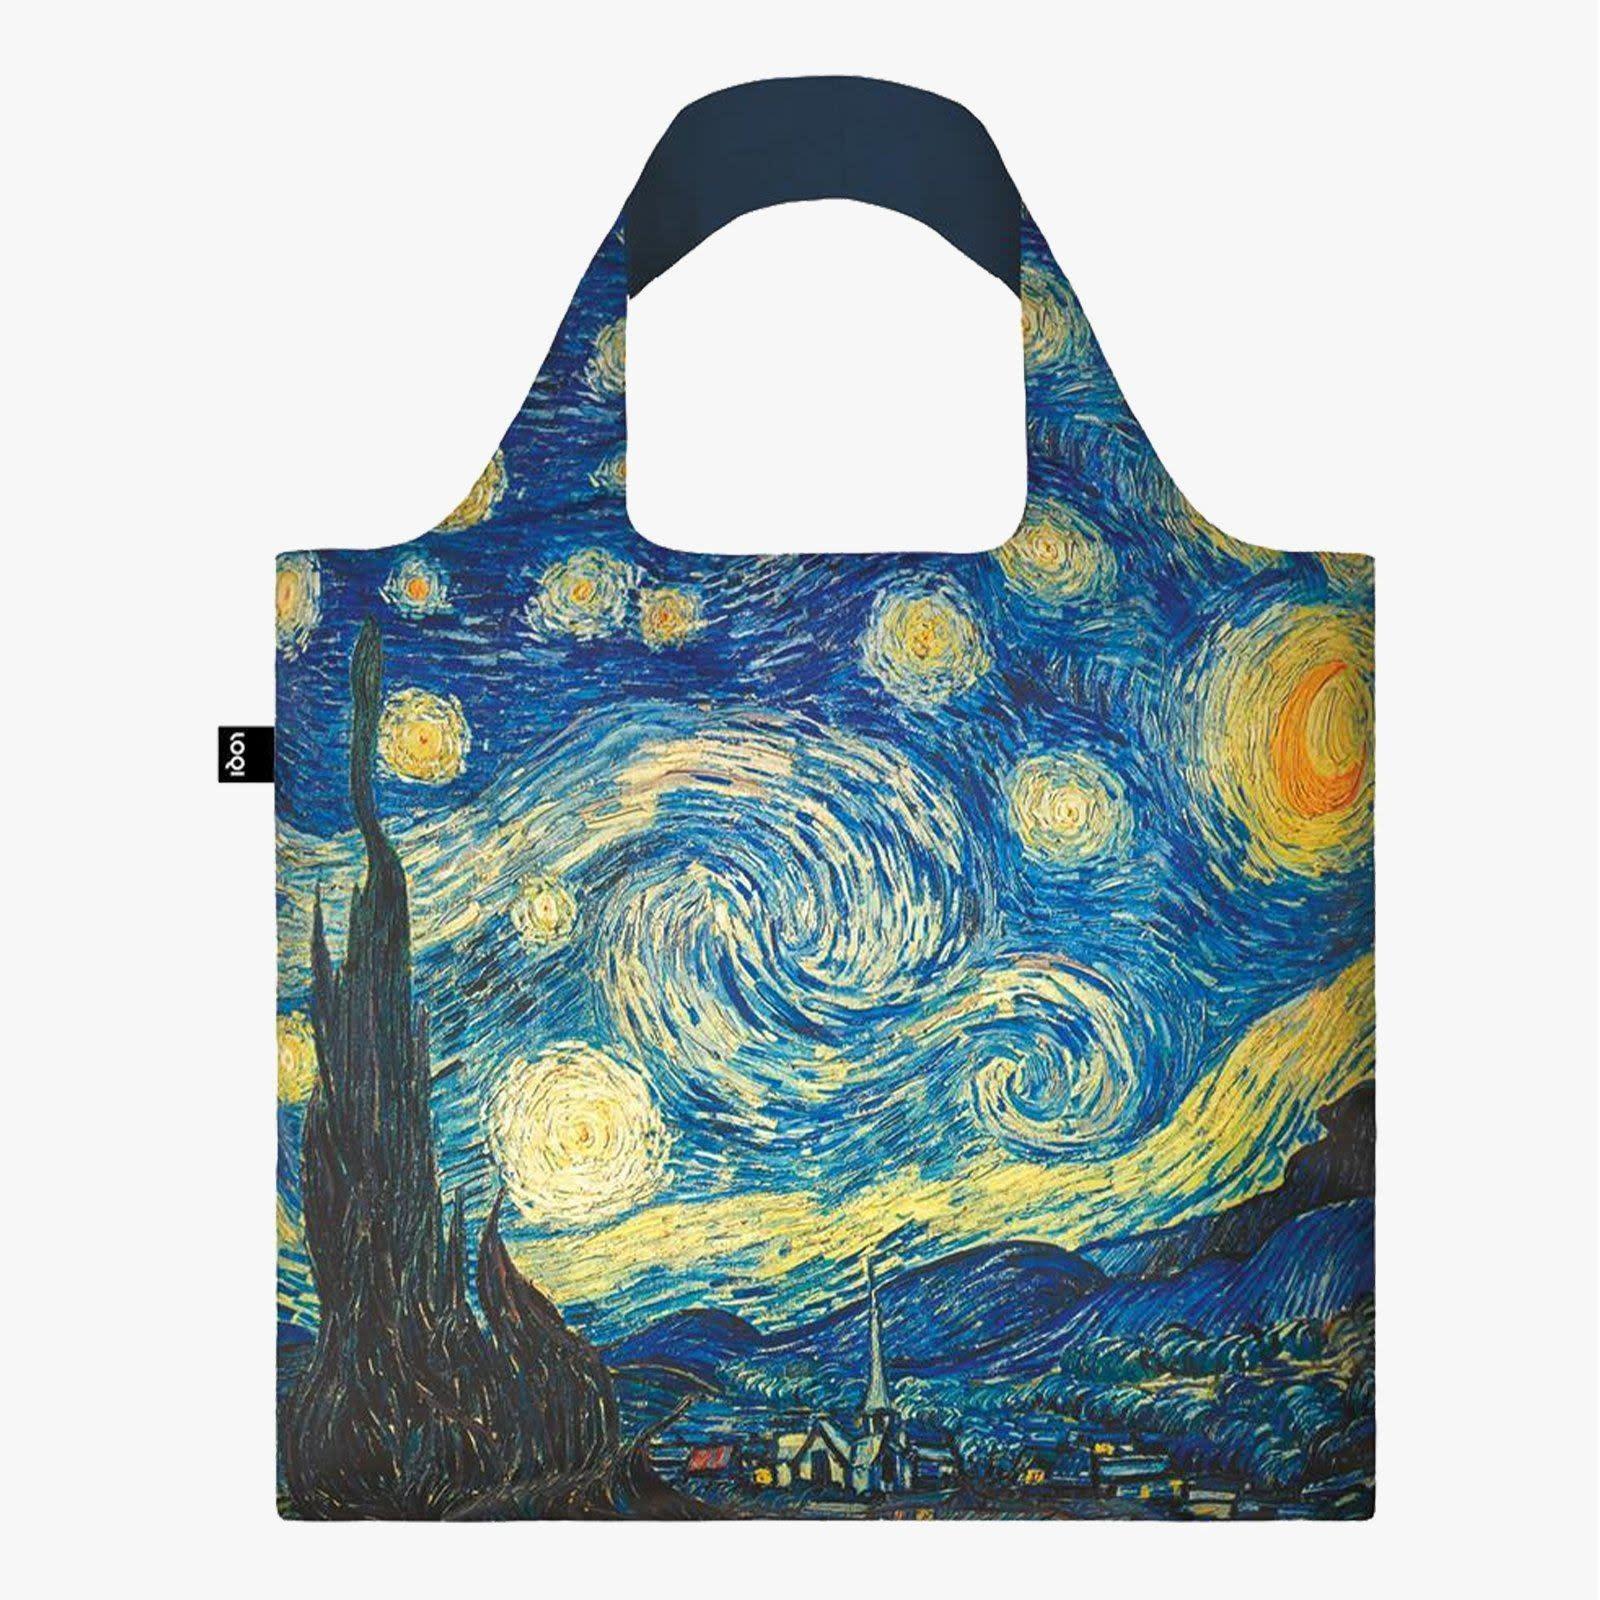 Loqi Tote Bag - Museum - Van Gogh - The Starry Night 1889